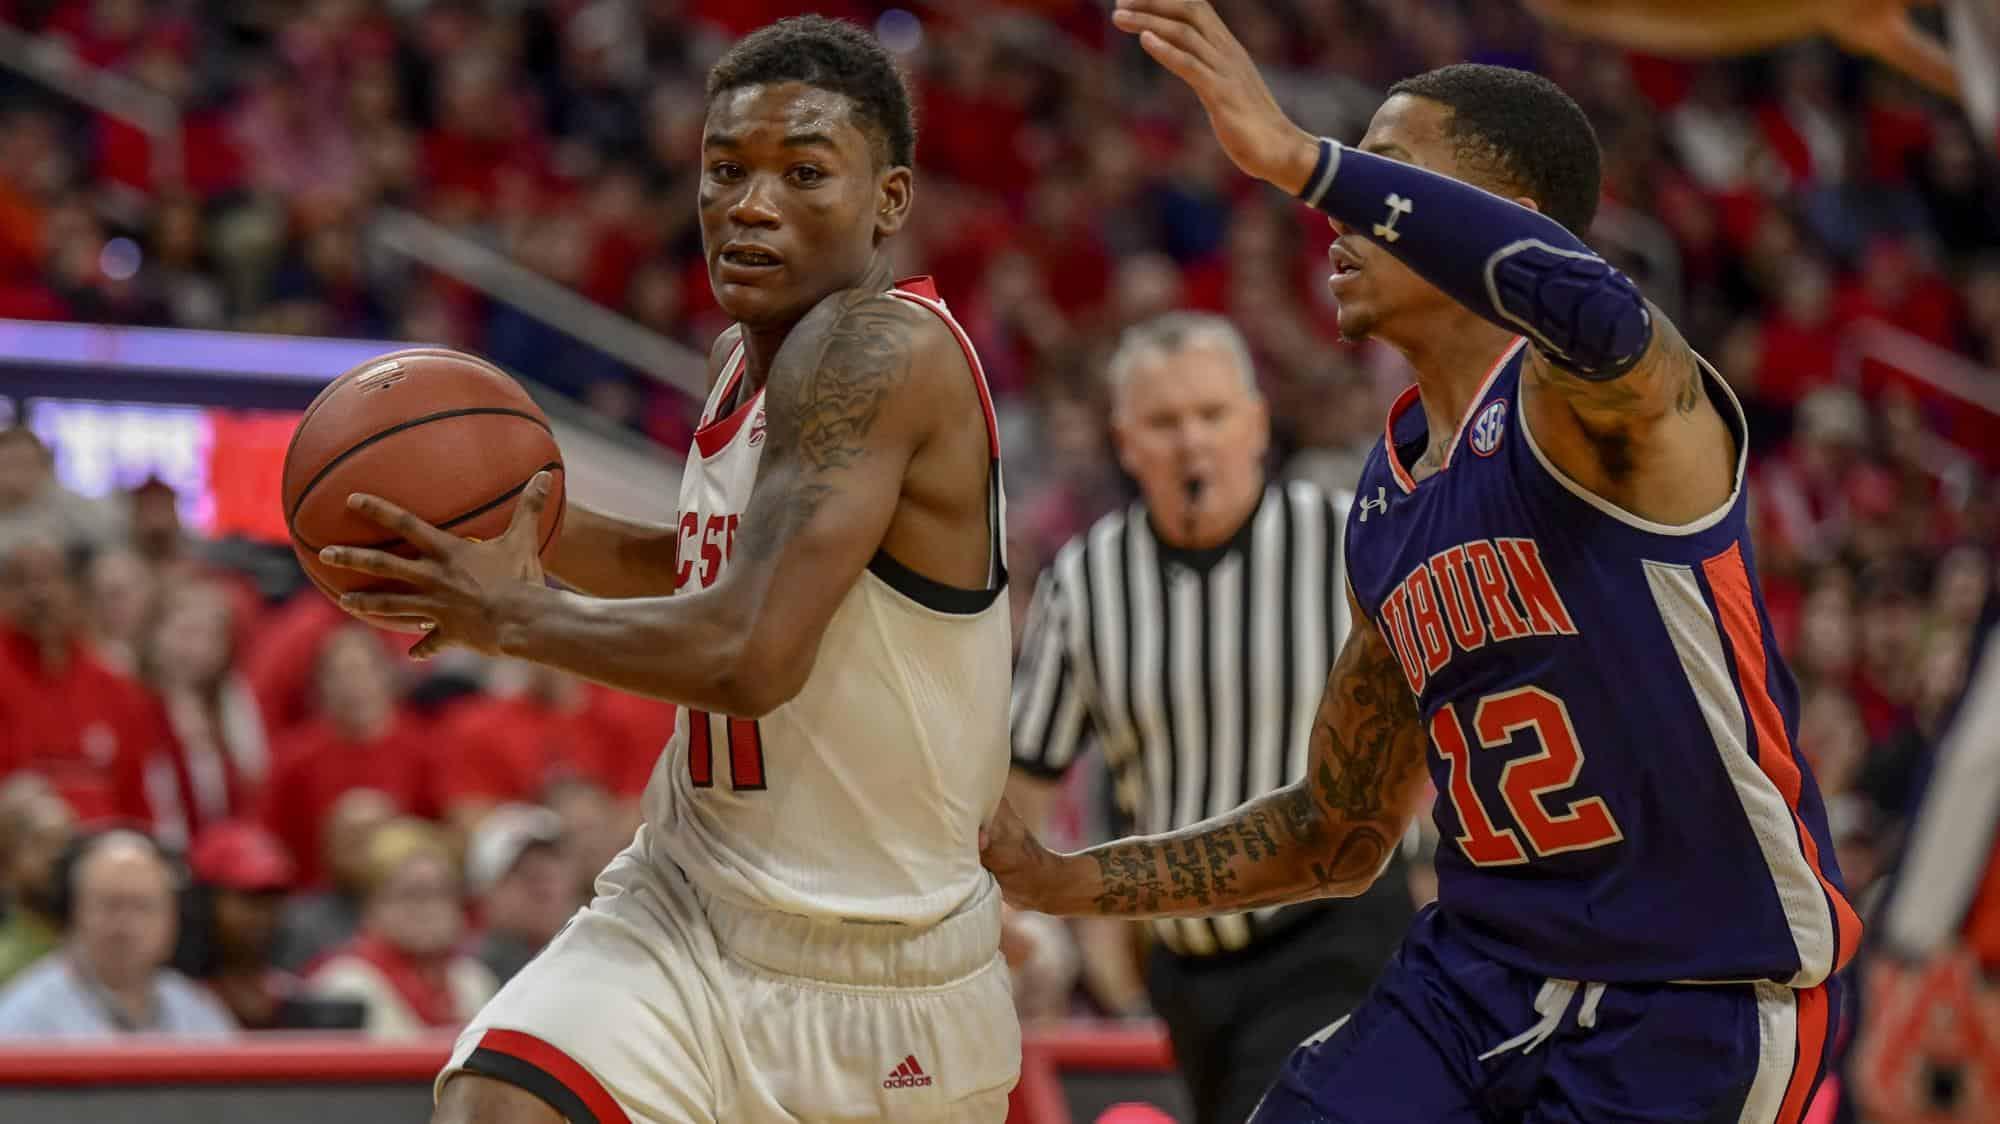 BasketballNcaa - NC State - Markell Johnson